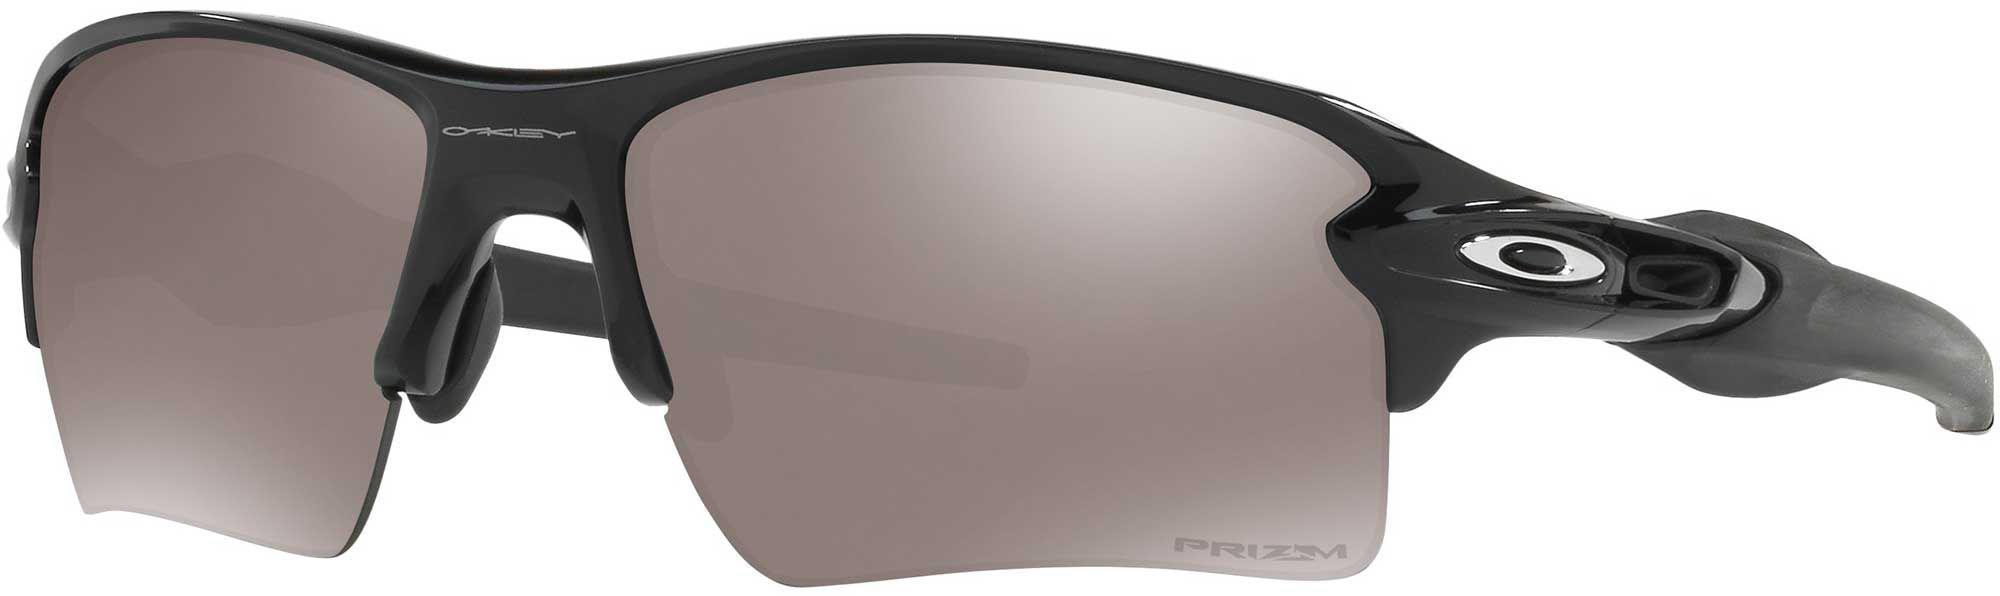 649864705d ... low price lyst oakley flak 2.0 xl prizm daily polarized sunglasses in  black e6935 1101c